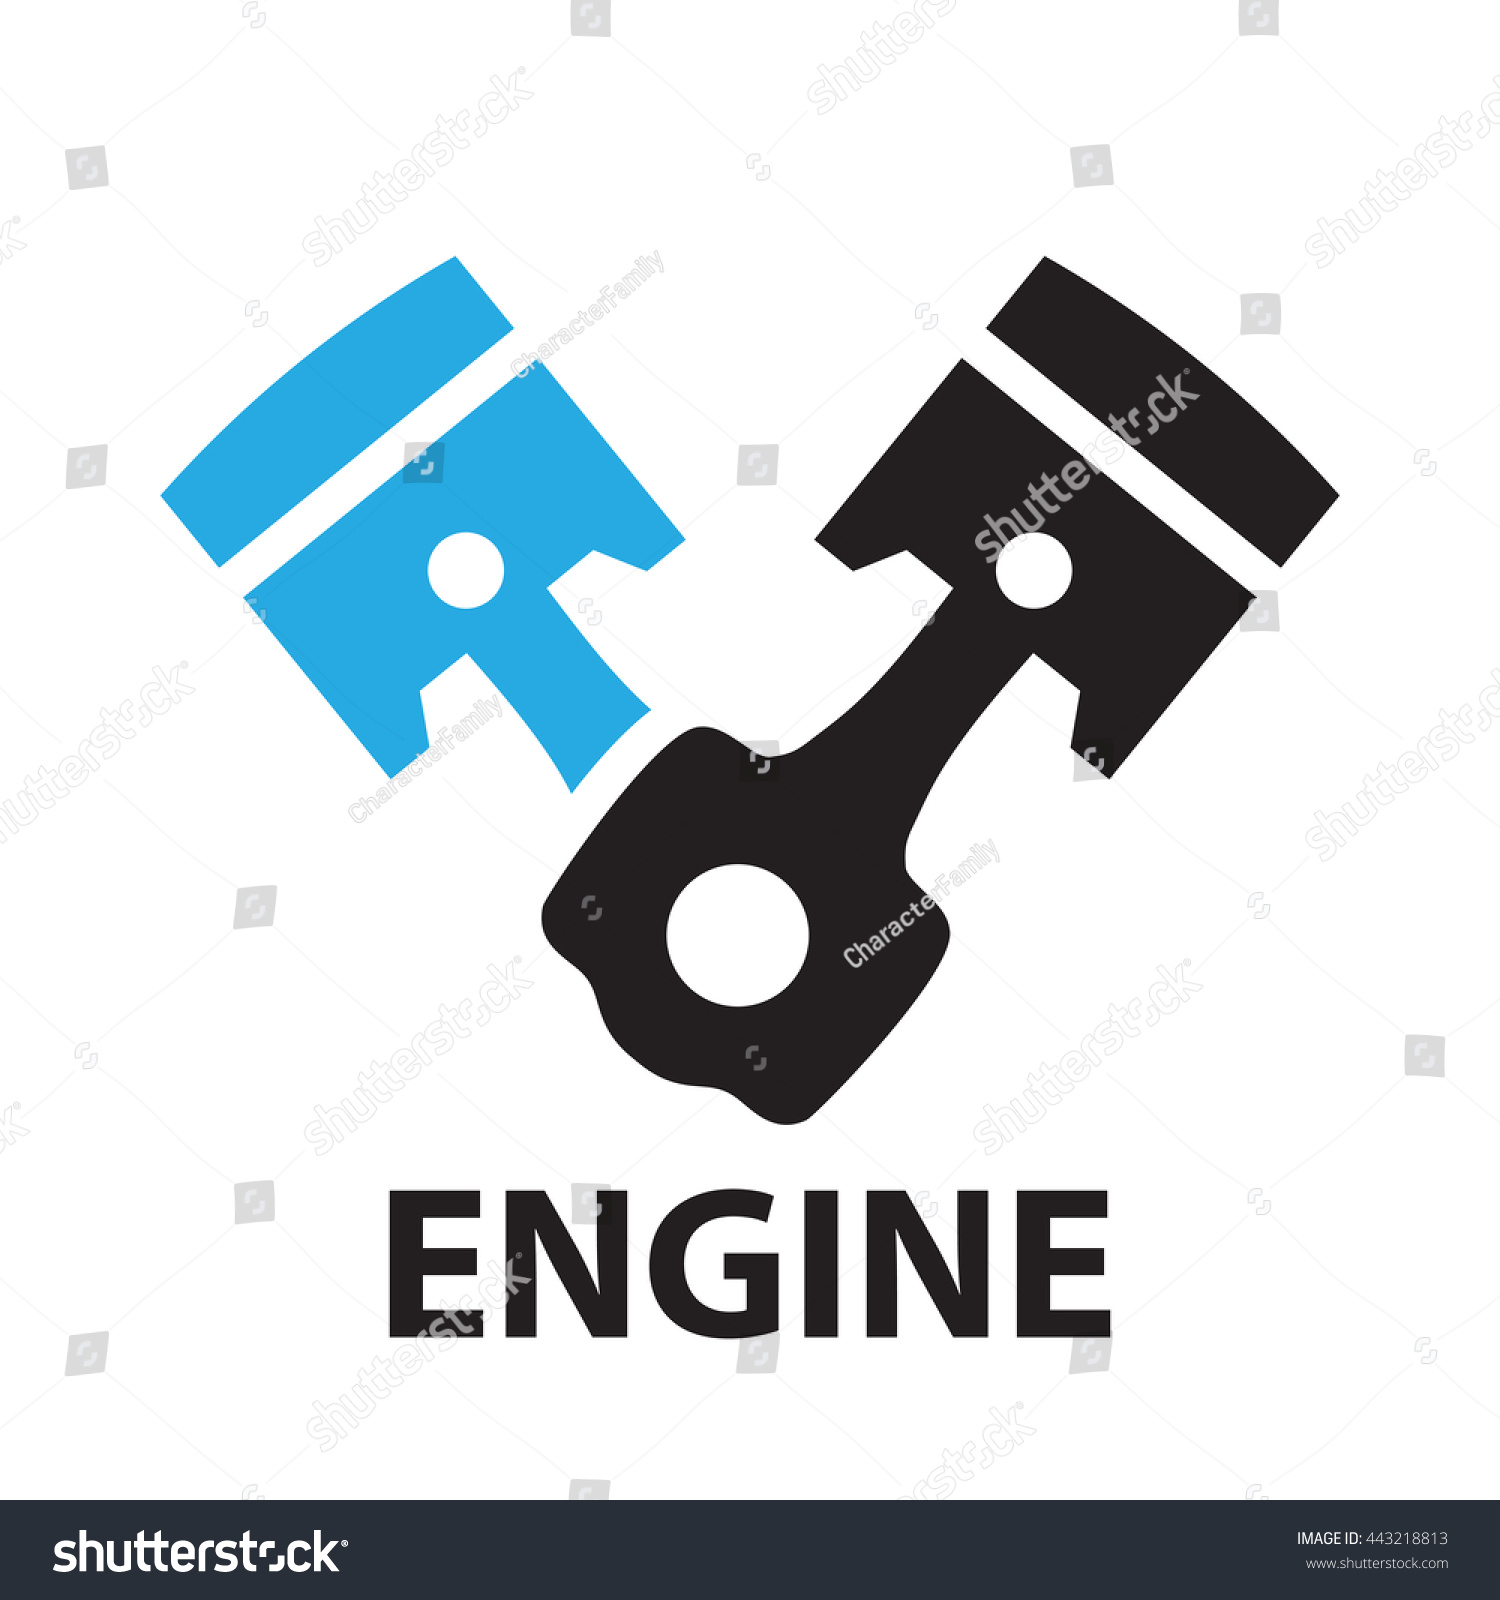 piston in car engine - photo #49